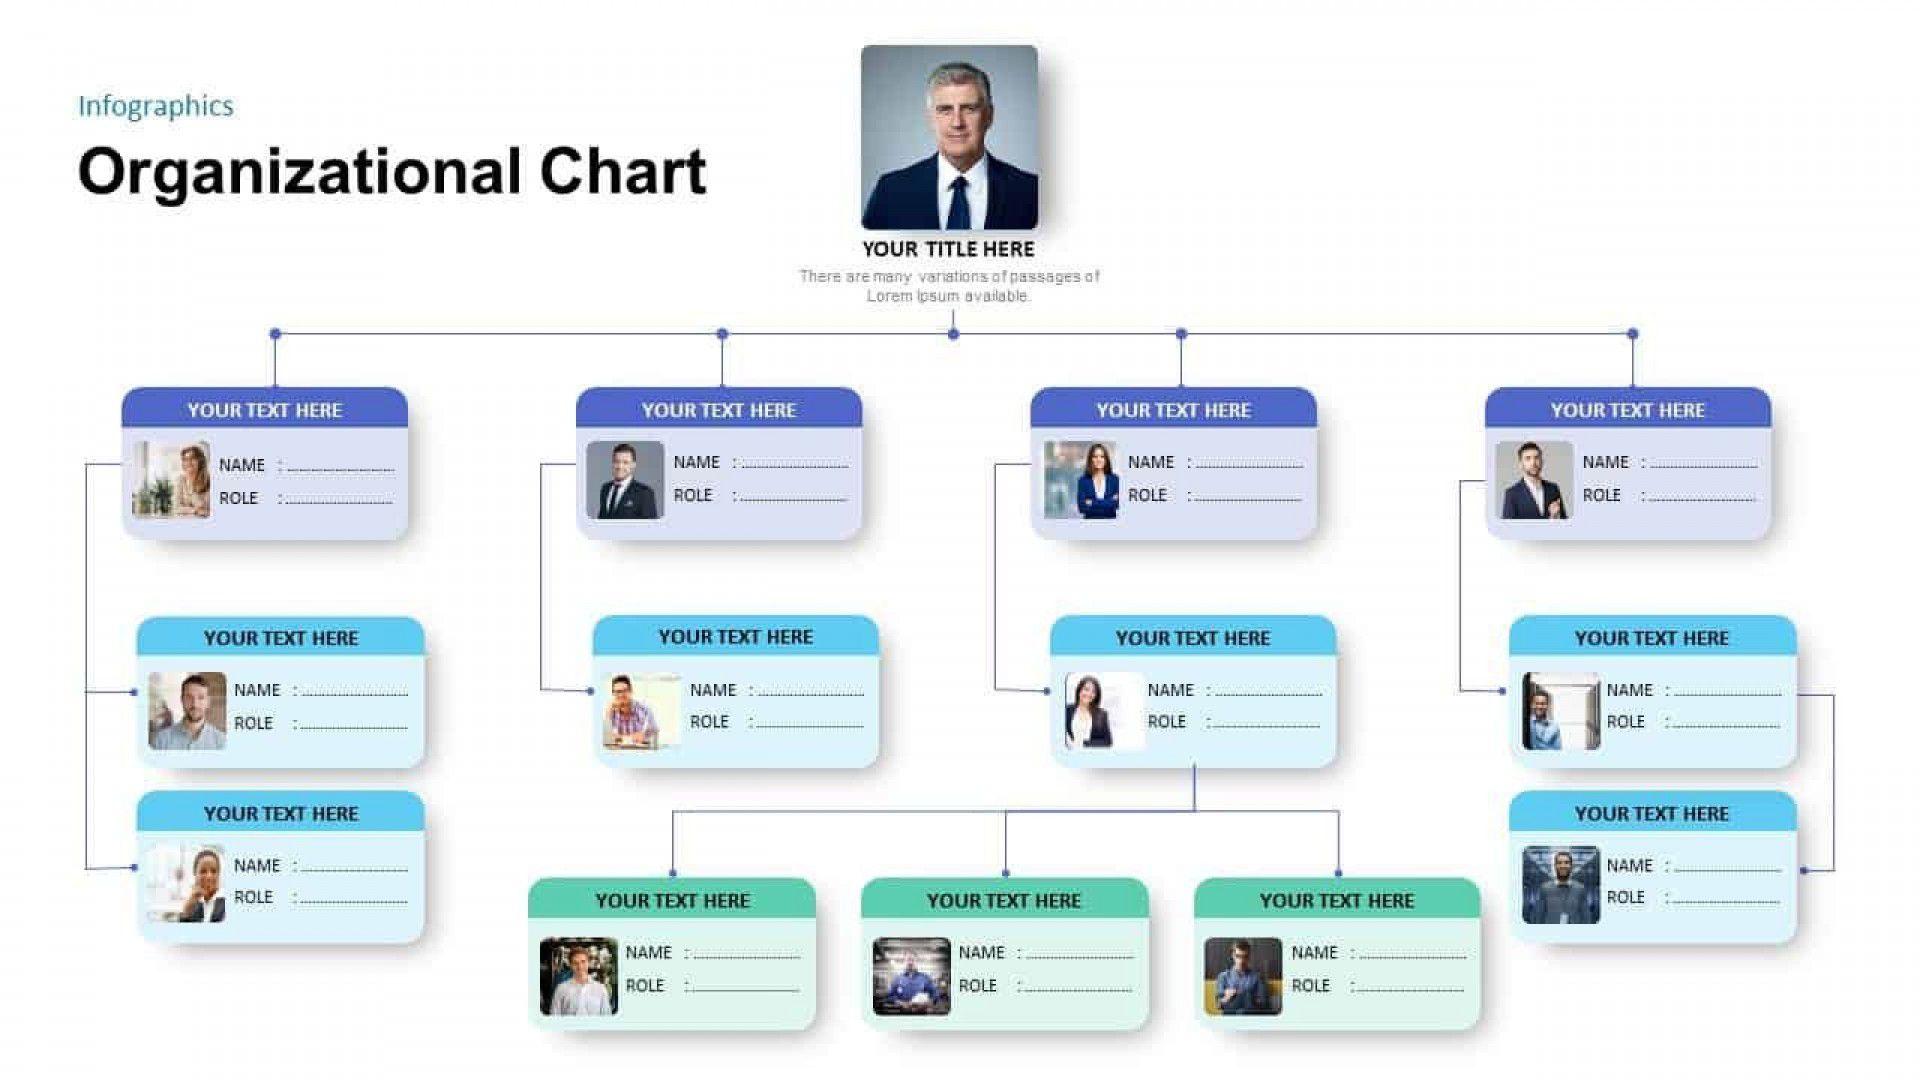 001 Best M Office Org Chart Template Picture  Microsoft Free OrganizationalFull